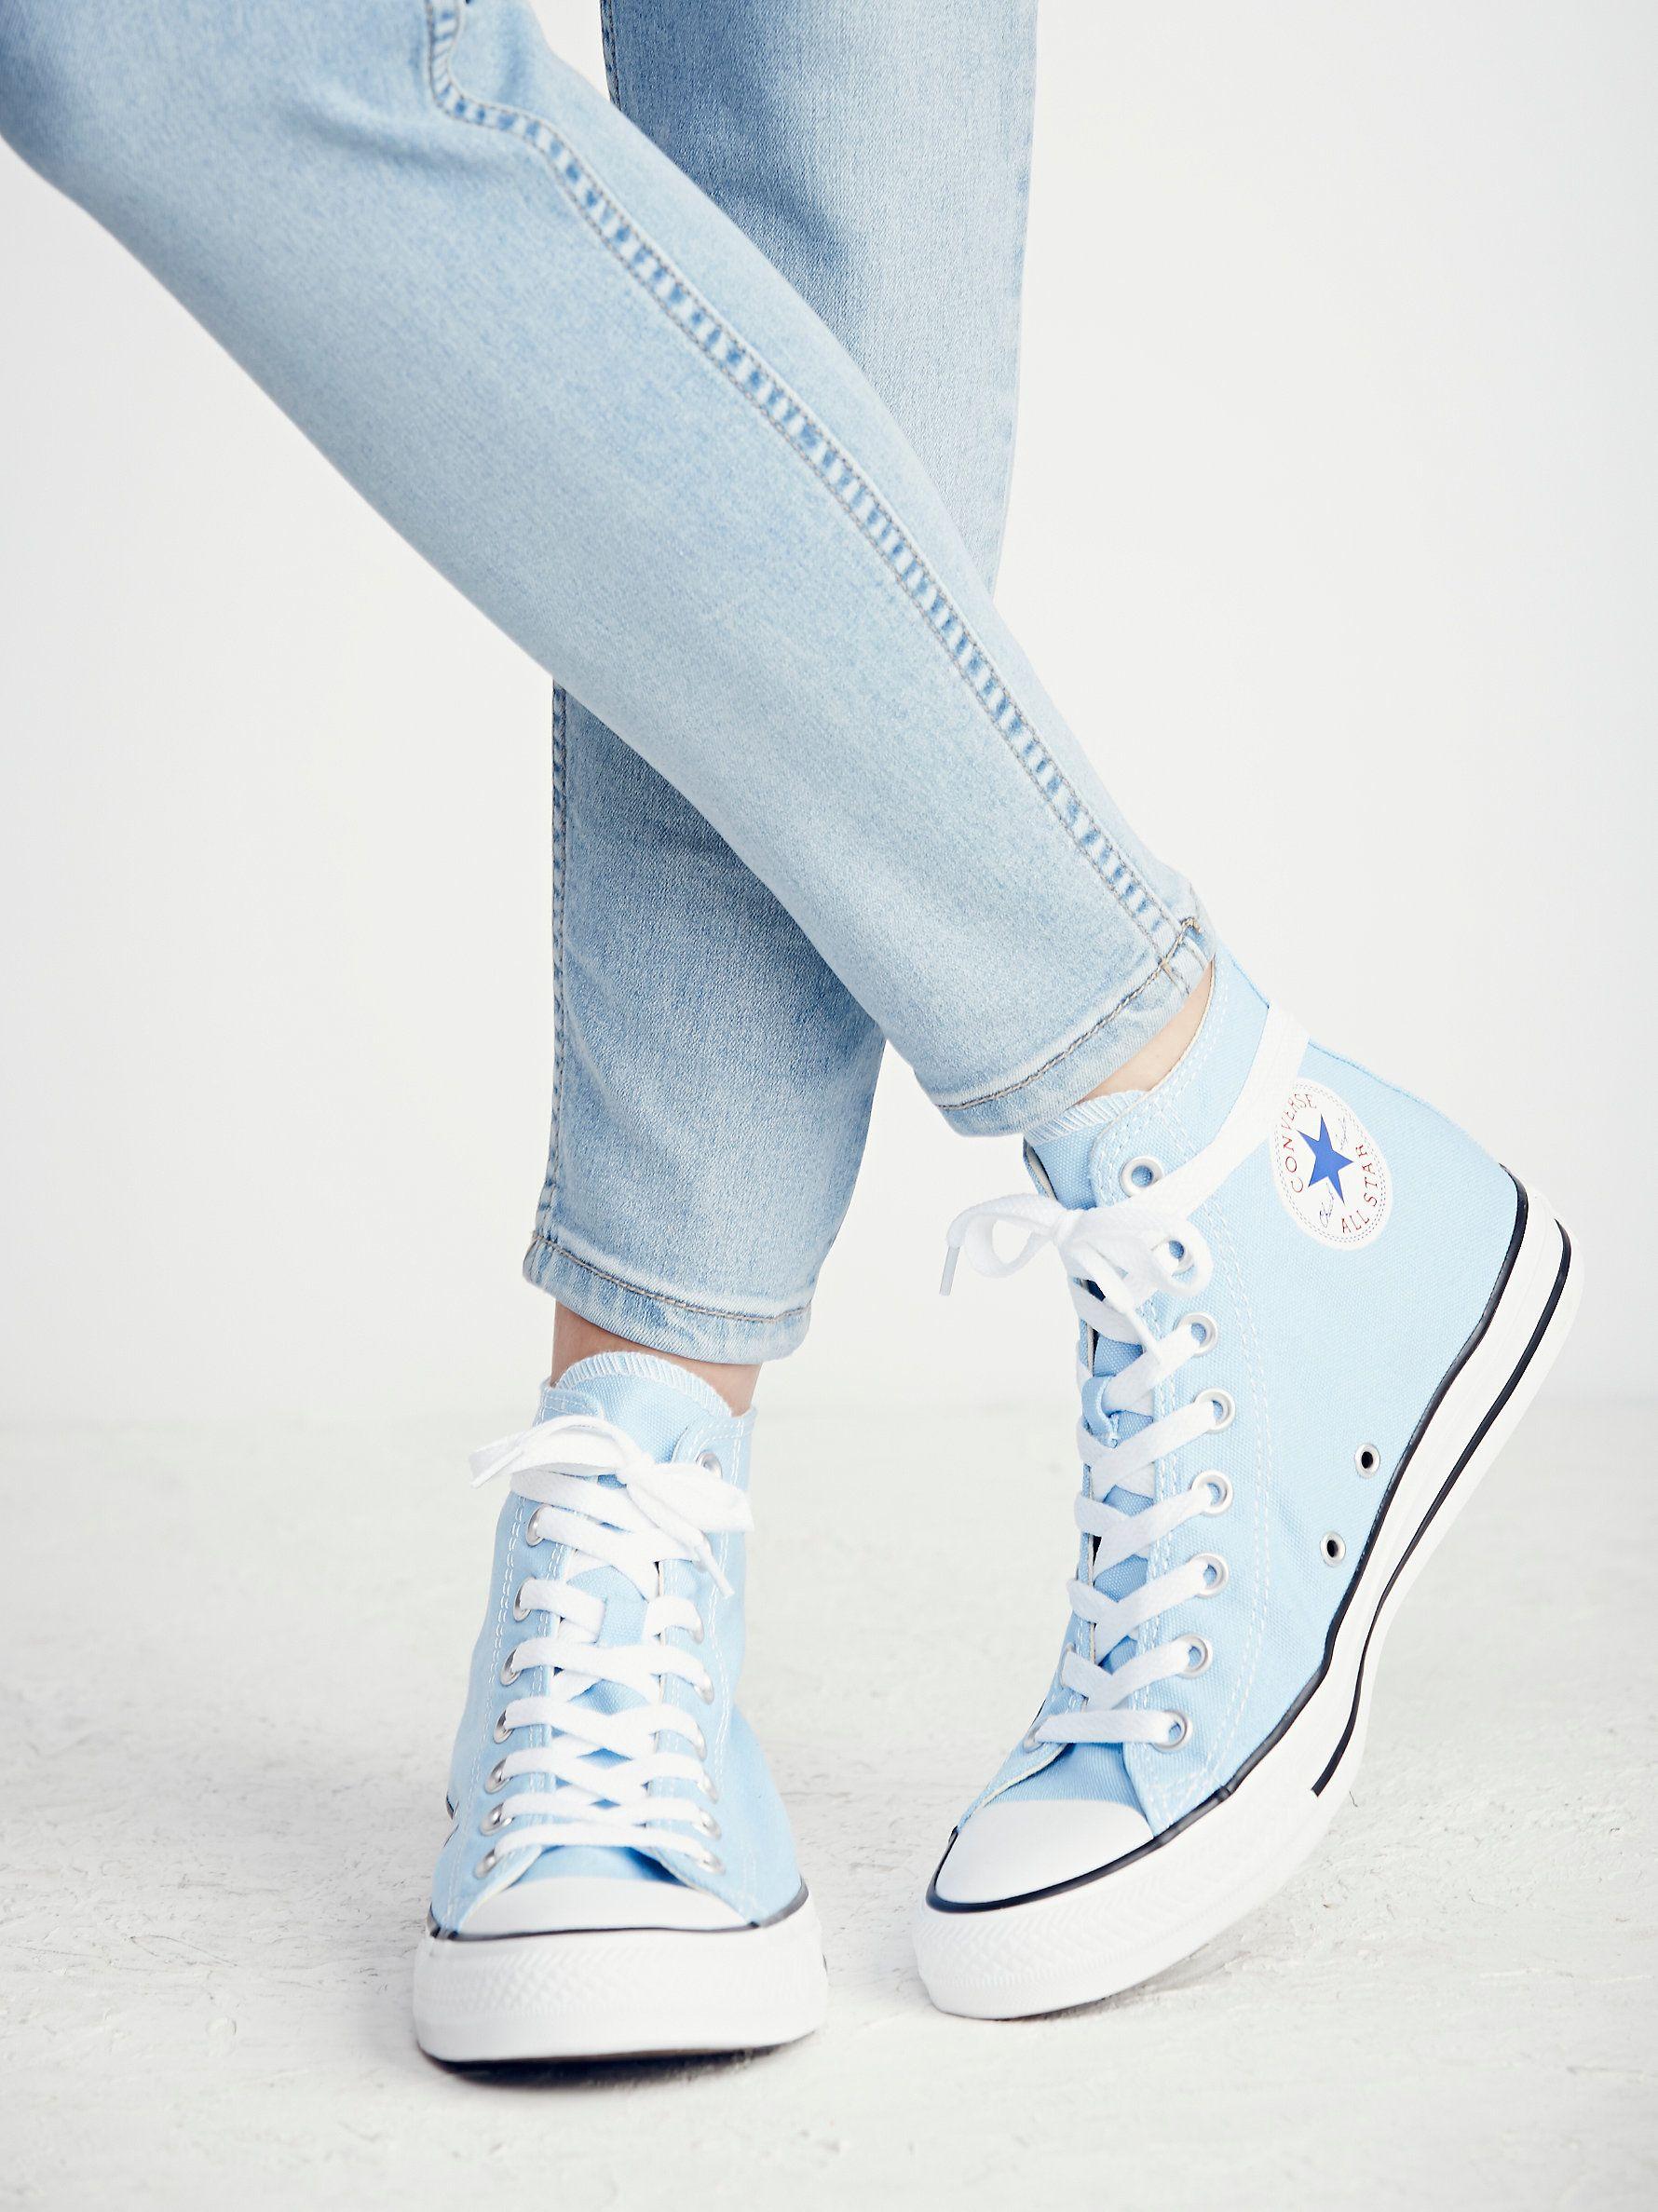 9bbf9d39ab4056 Charlie Hi Top Converse Sneaker in 2019